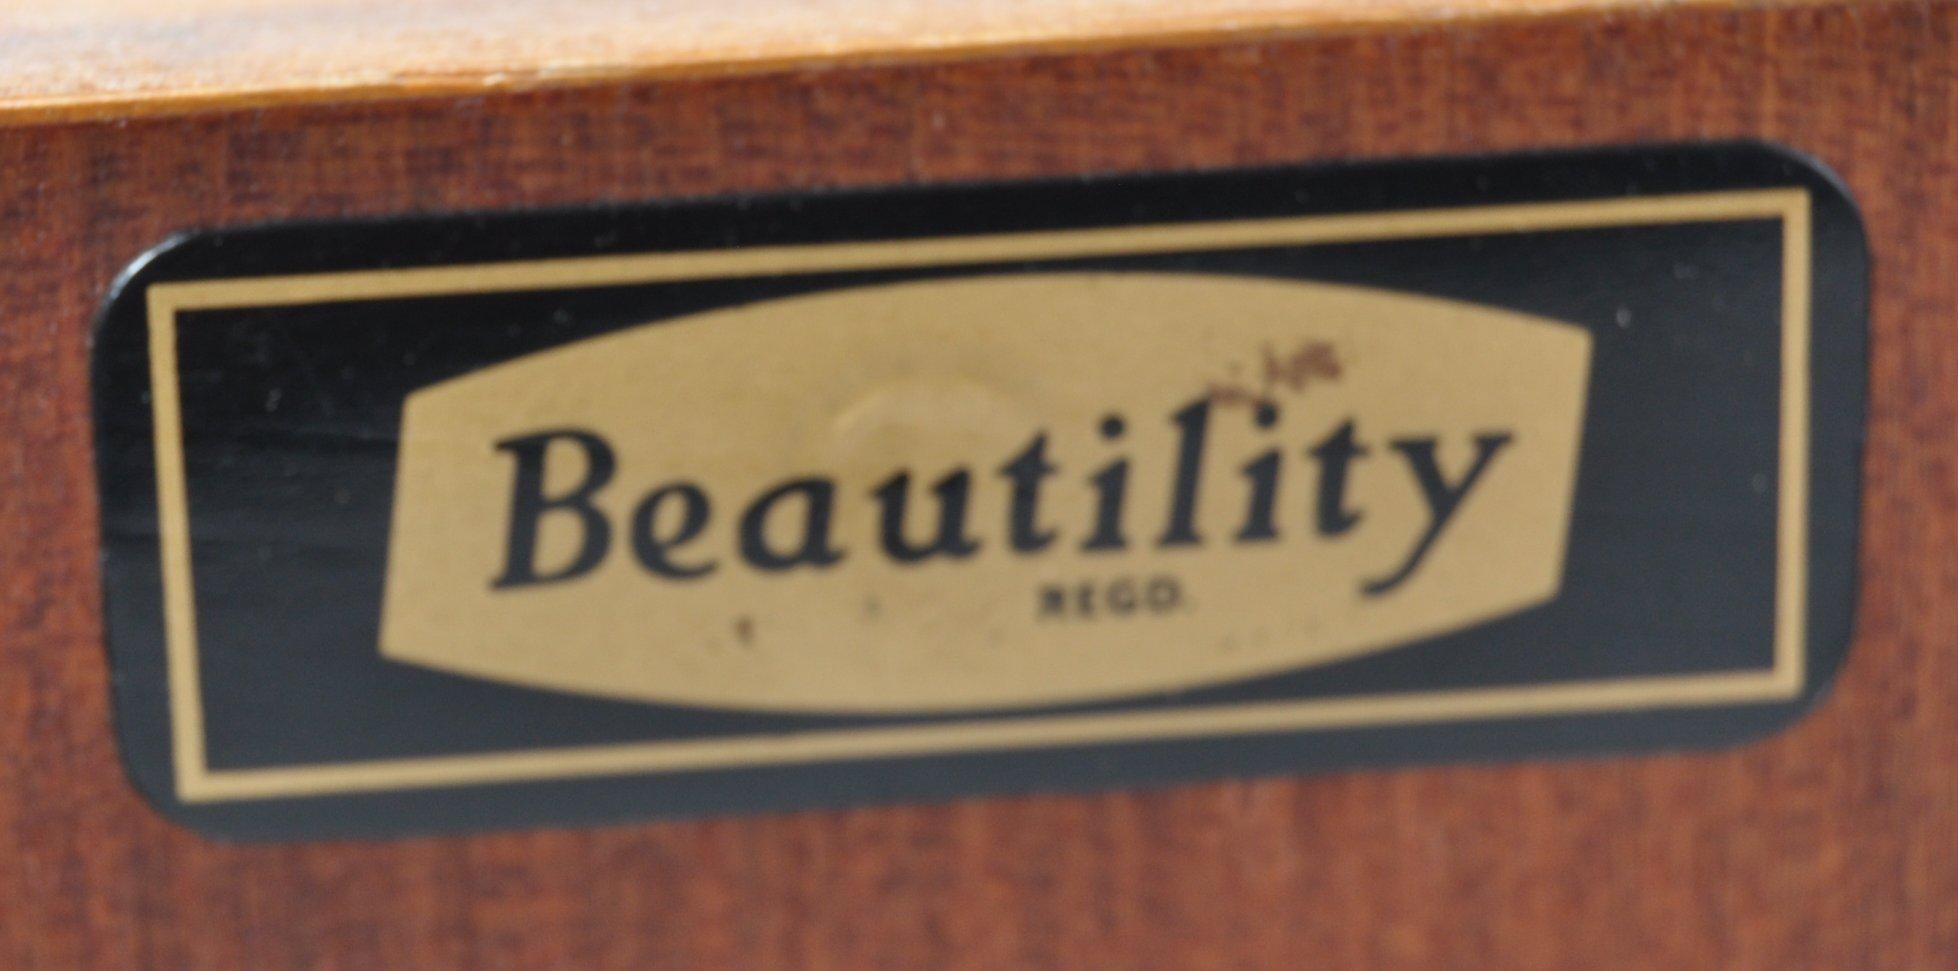 BEAUTILITY RETRO TEAK SIDEBOARD HAVING STYLIZED BELT BUCKLE HANDLES - Image 10 of 10